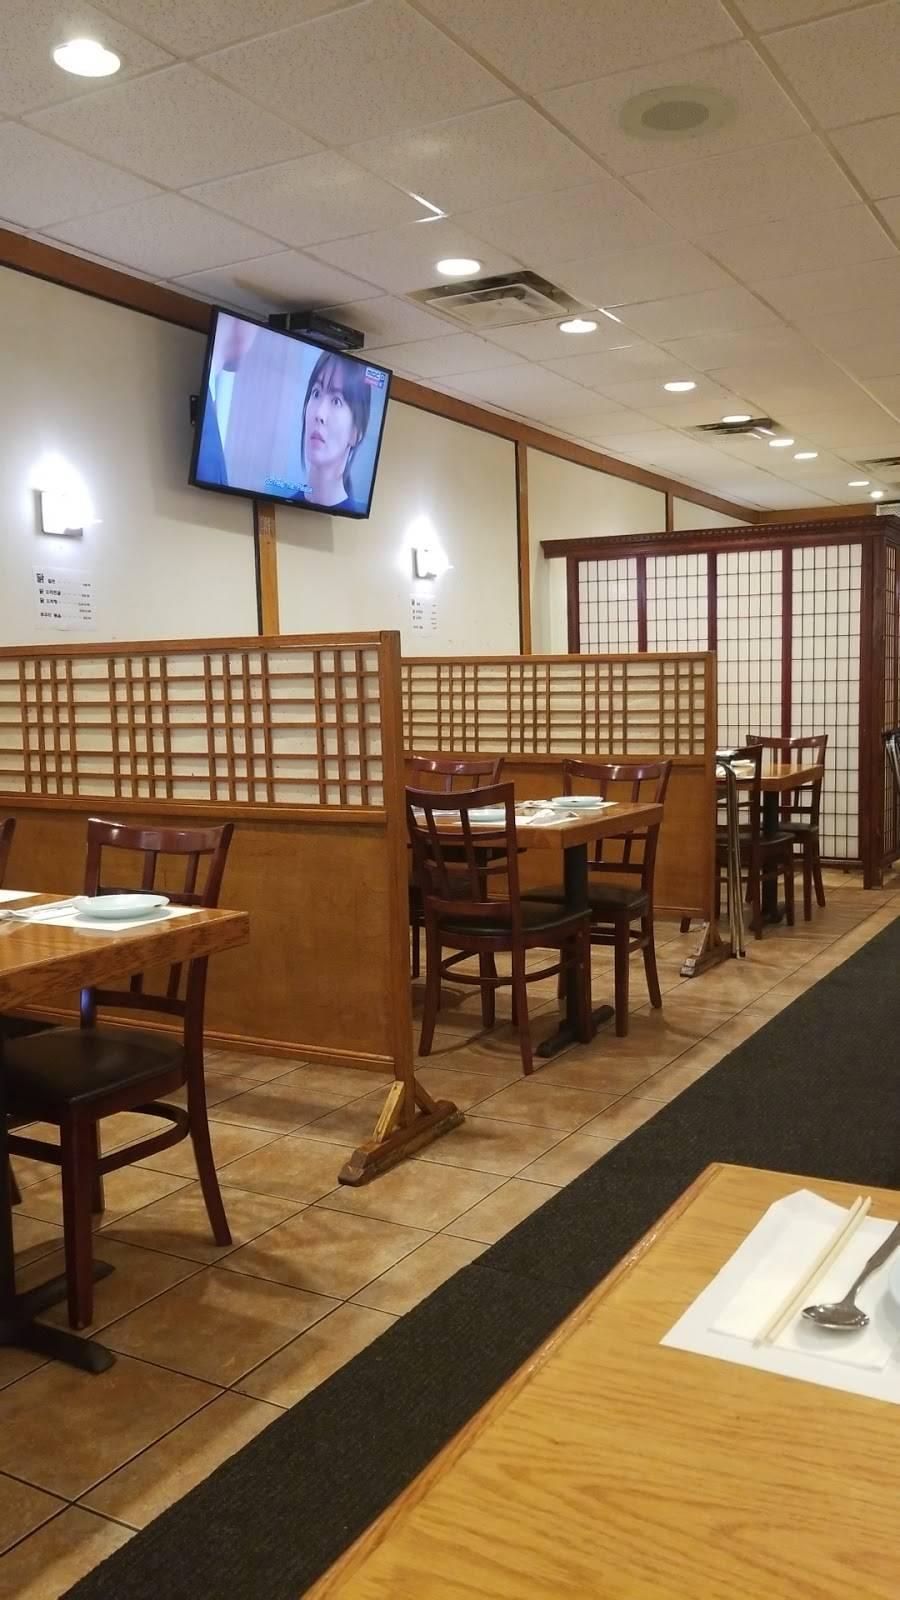 Miga 미가 | restaurant | 344 Broad Ave, Leonia, NJ 07605, USA | 2015928886 OR +1 201-592-8886